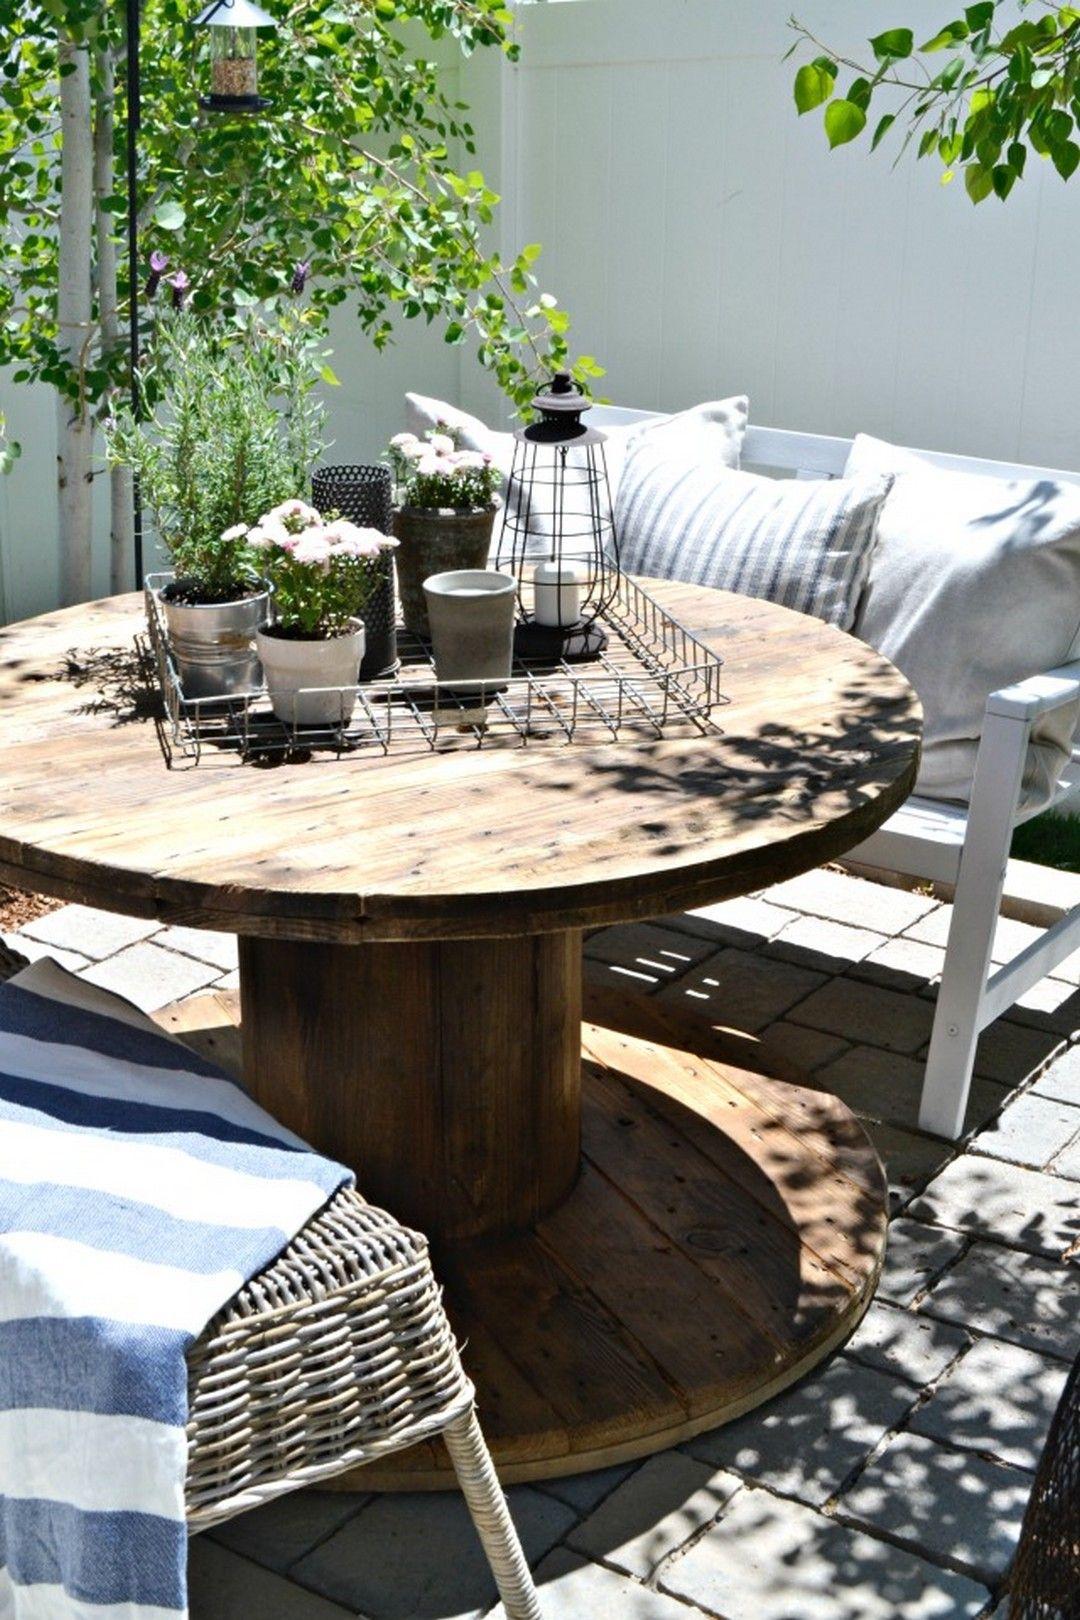 50 fantastic small patio ideas on a budget small patio